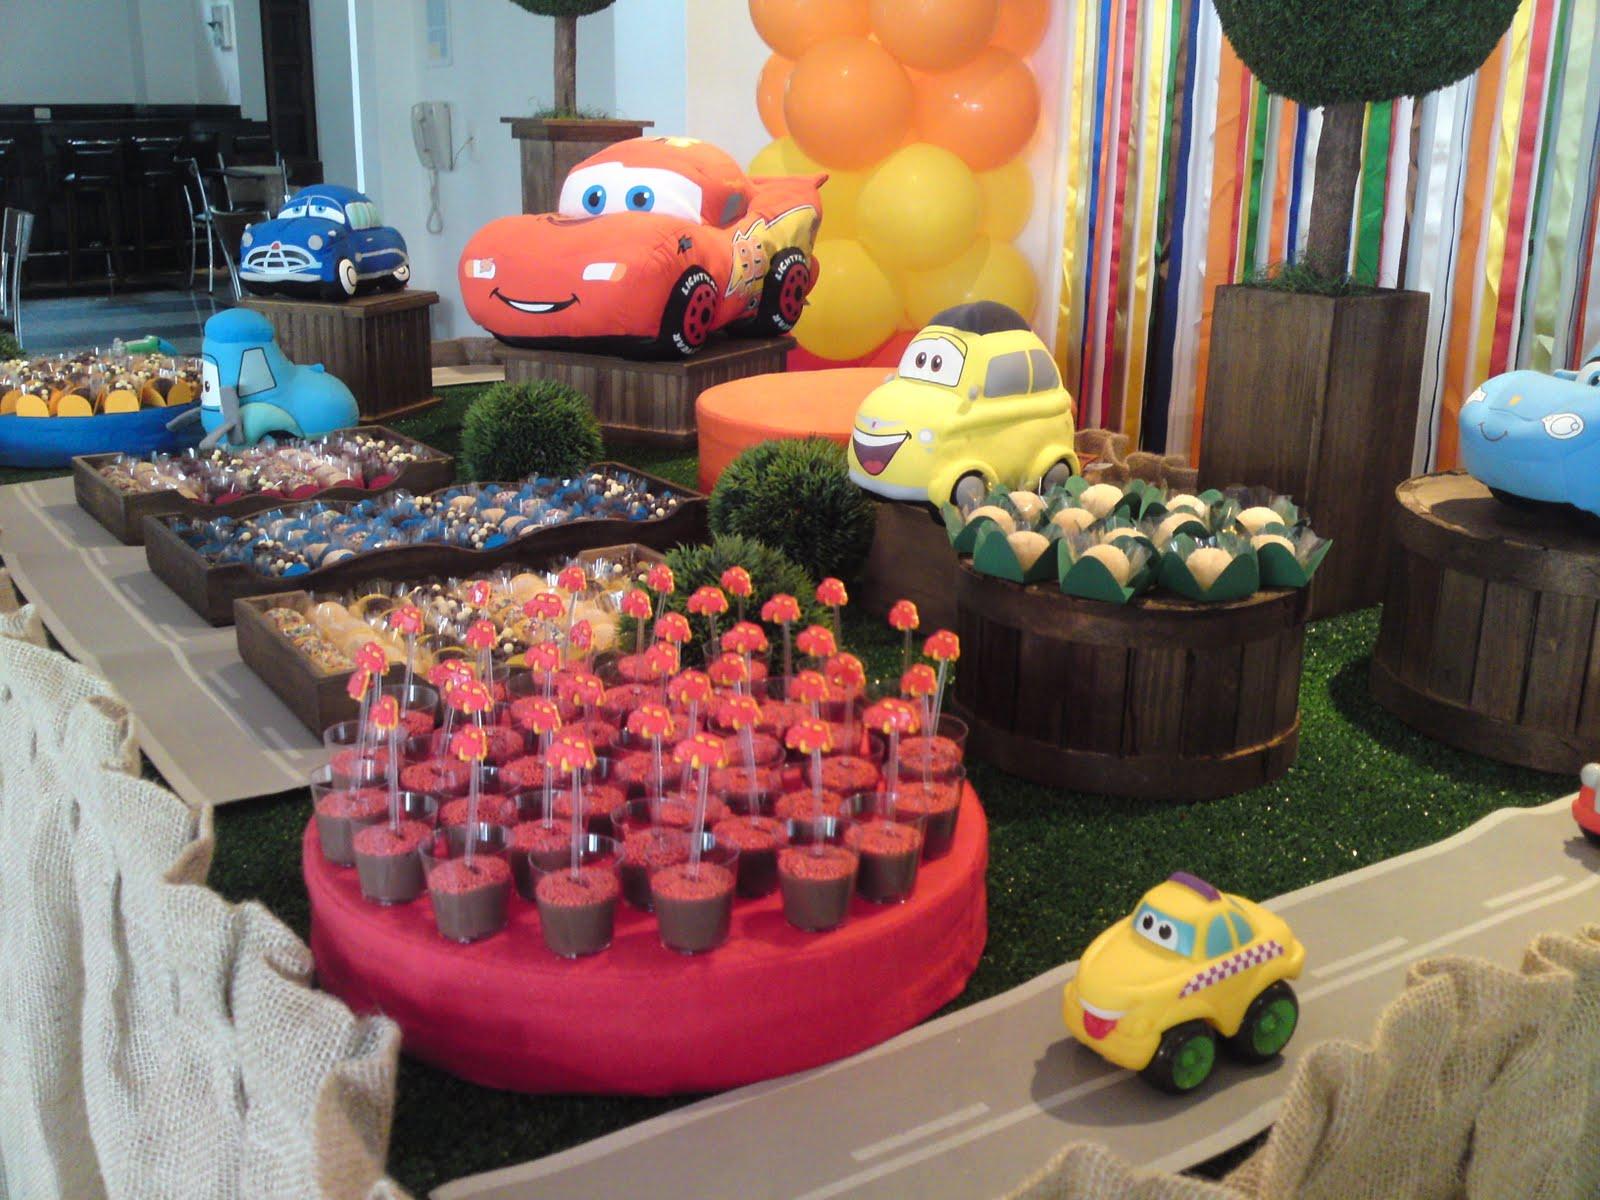 aniversario-de-crianca-tema-carros